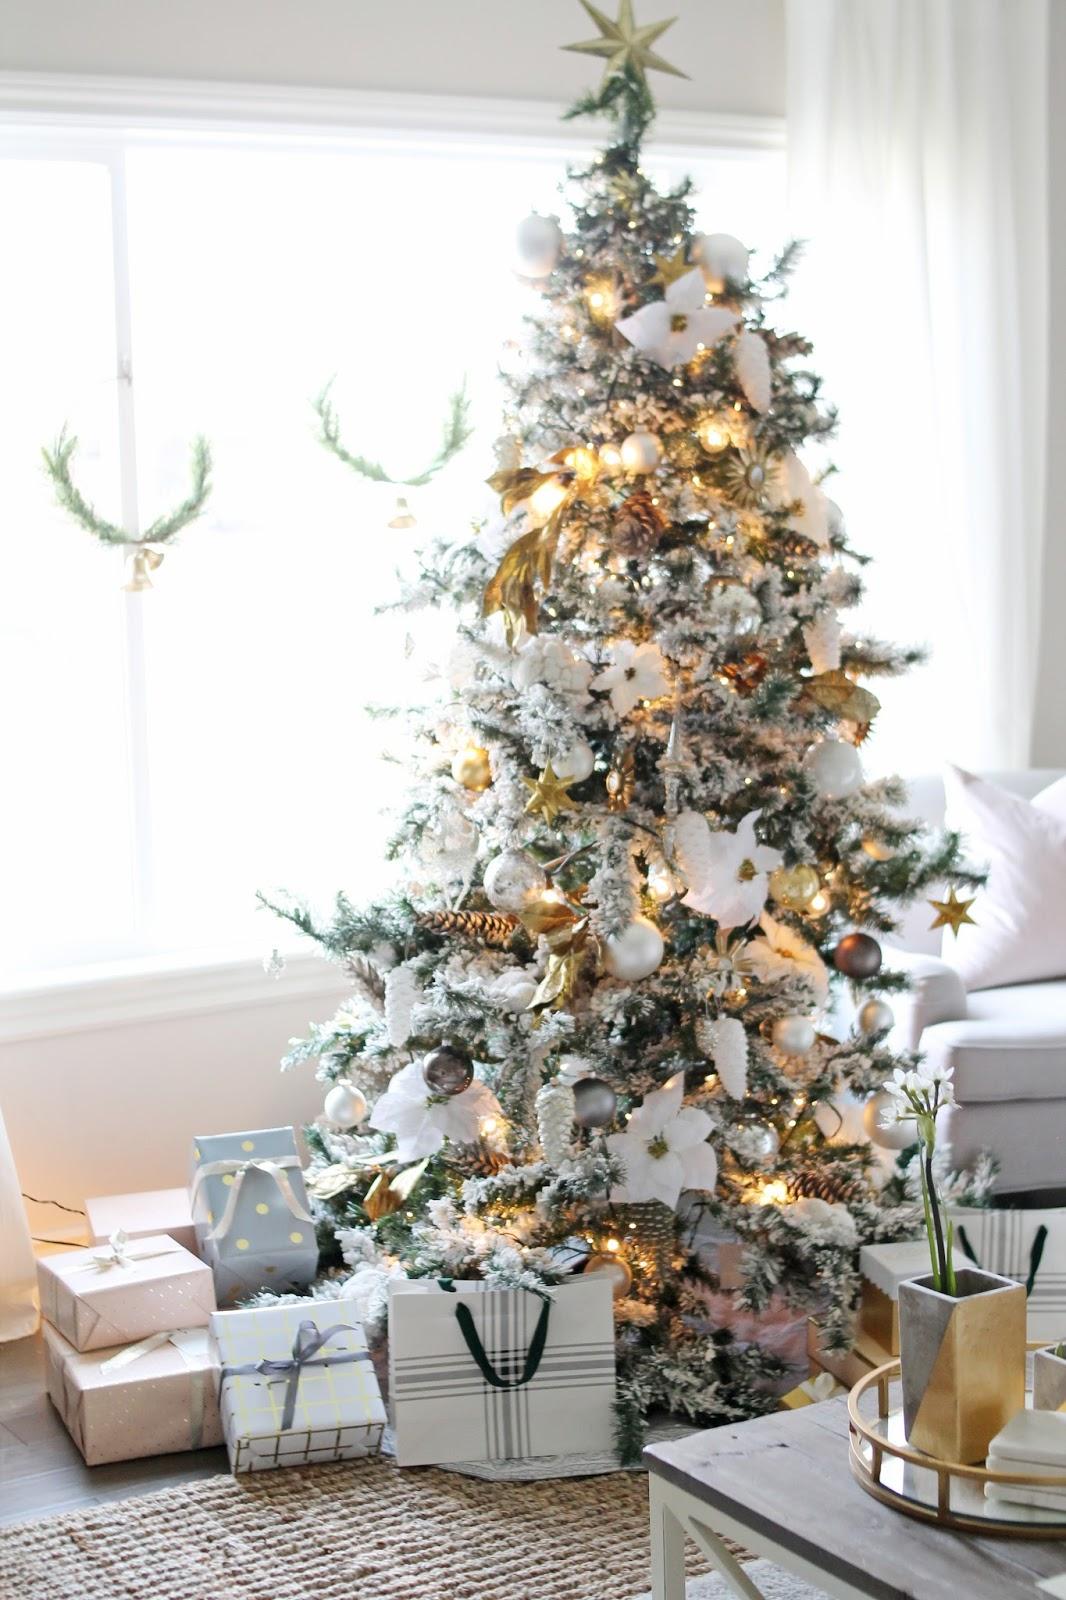 12th and White: Christmas Home Tour 2017